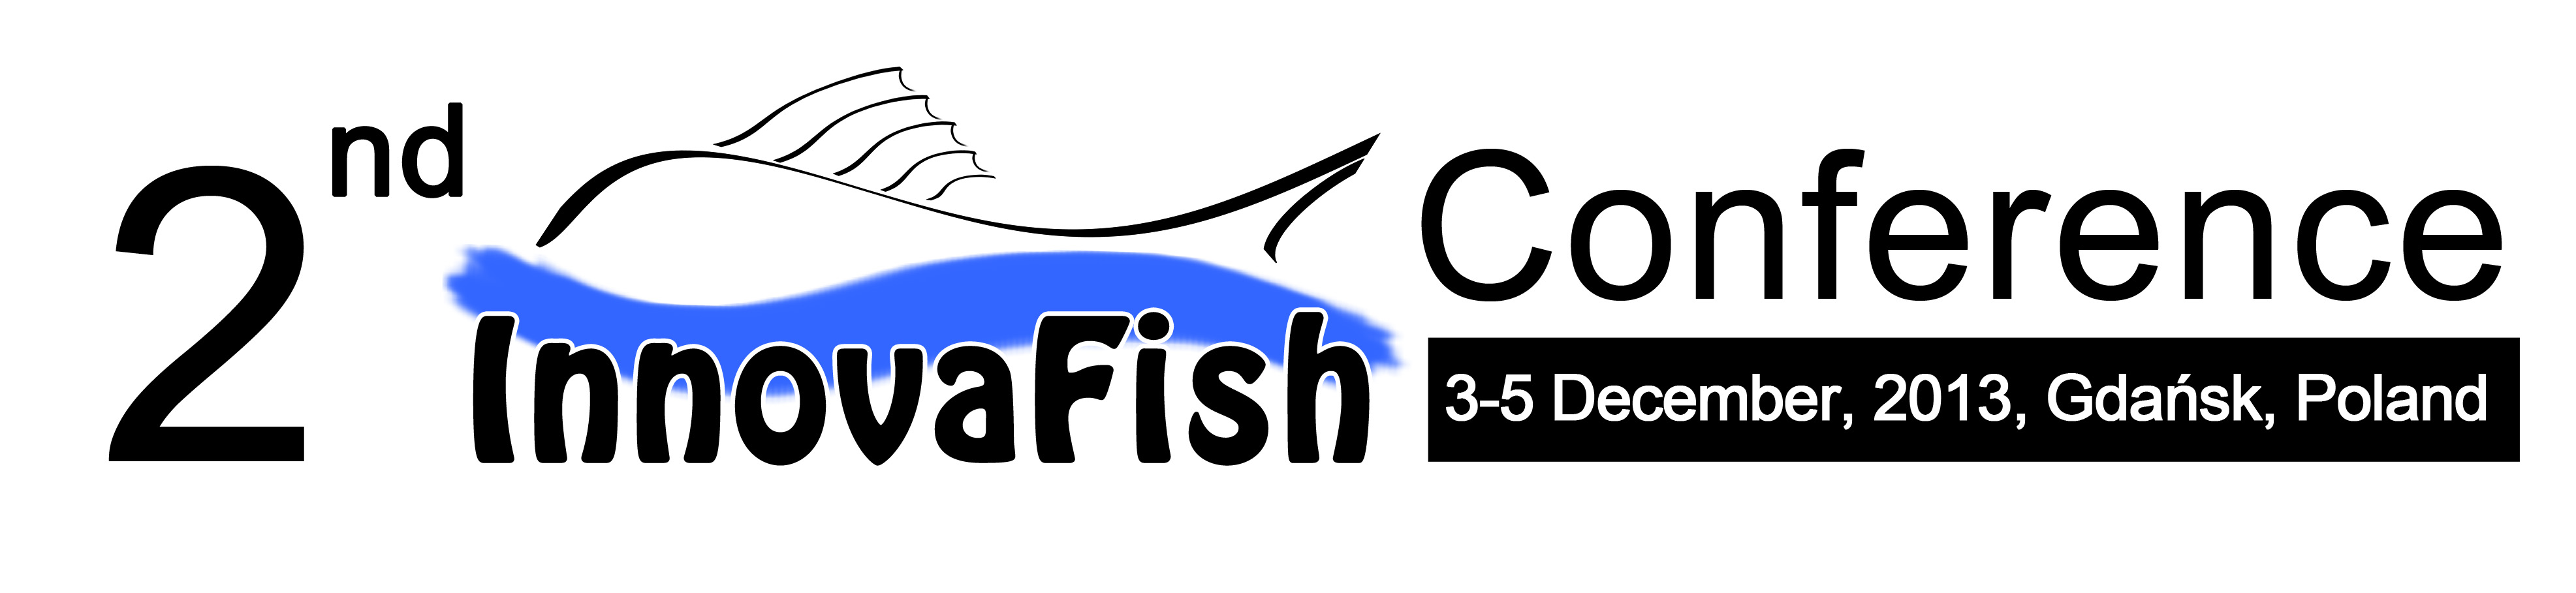 logo 2nd InnovaFish